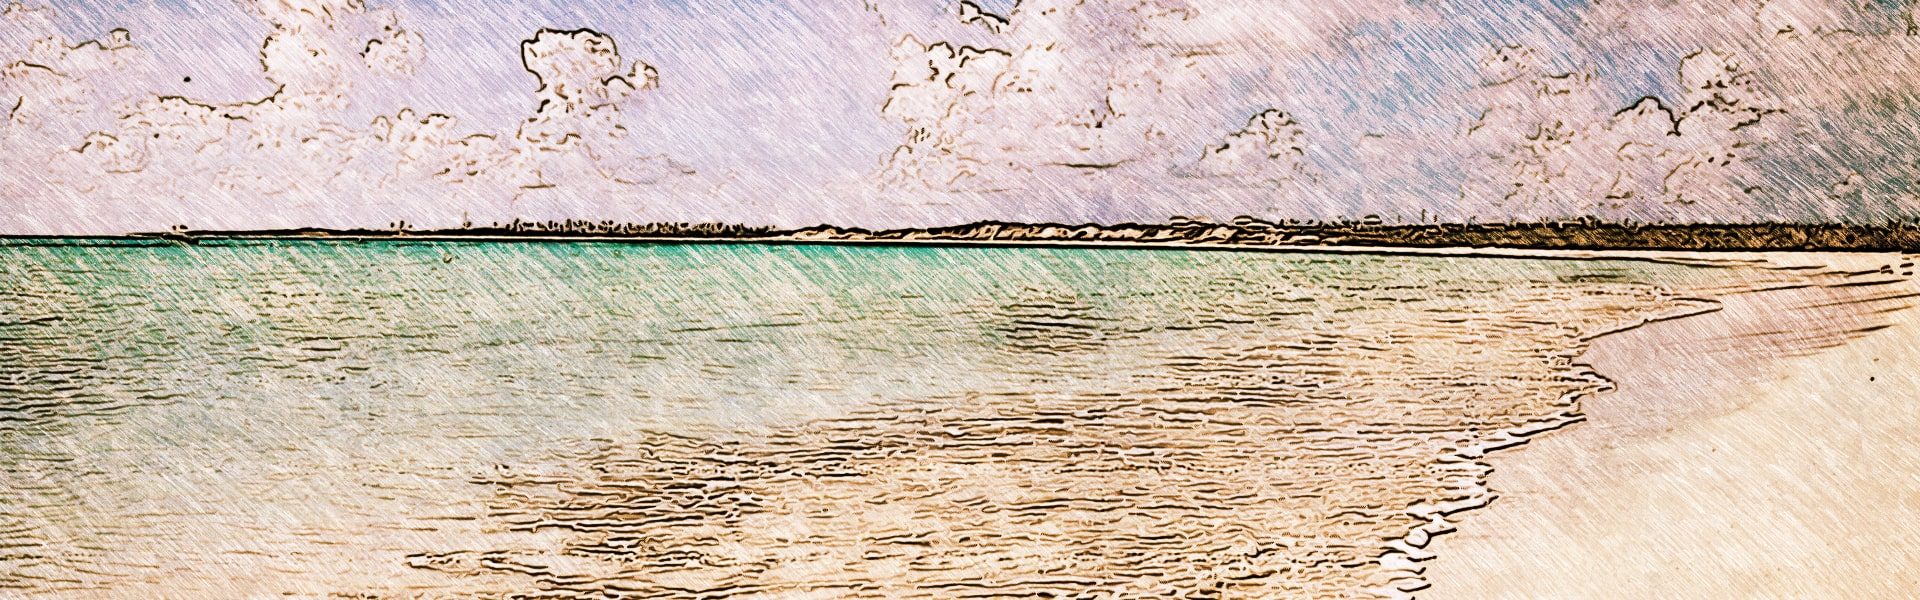 Anguilla-min